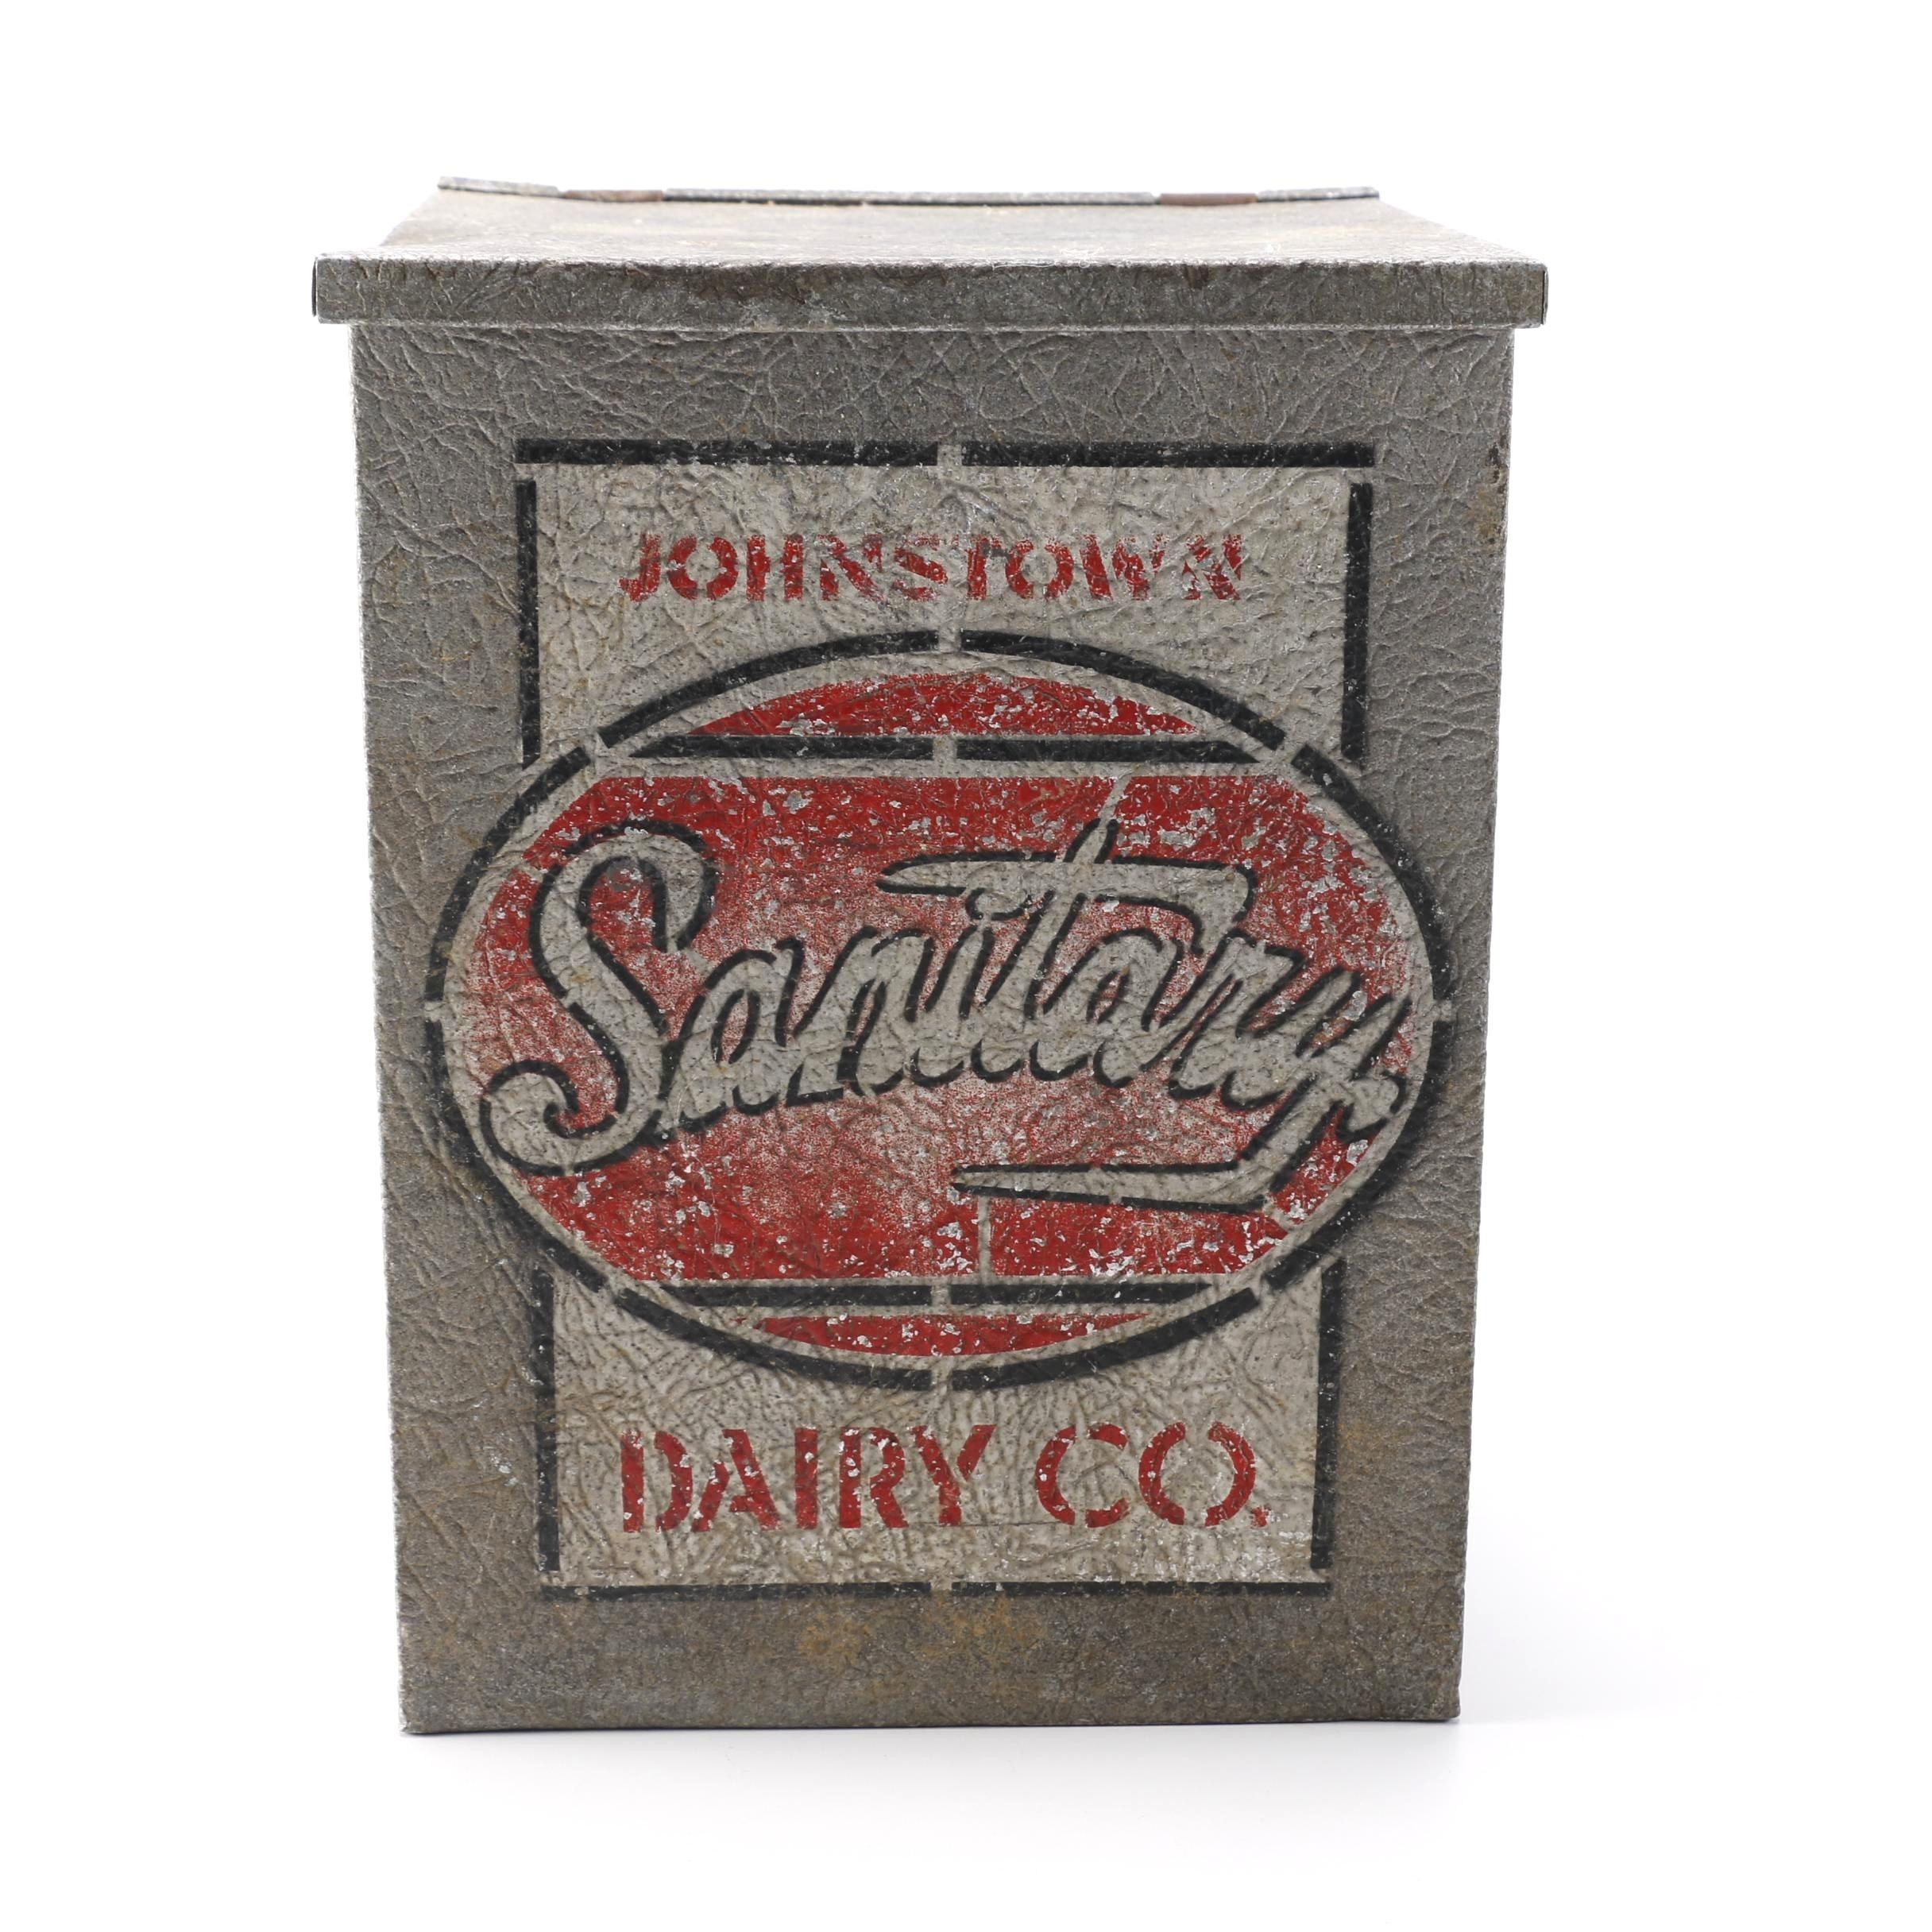 Vintage Johnstown Dairy Co. Milk Box